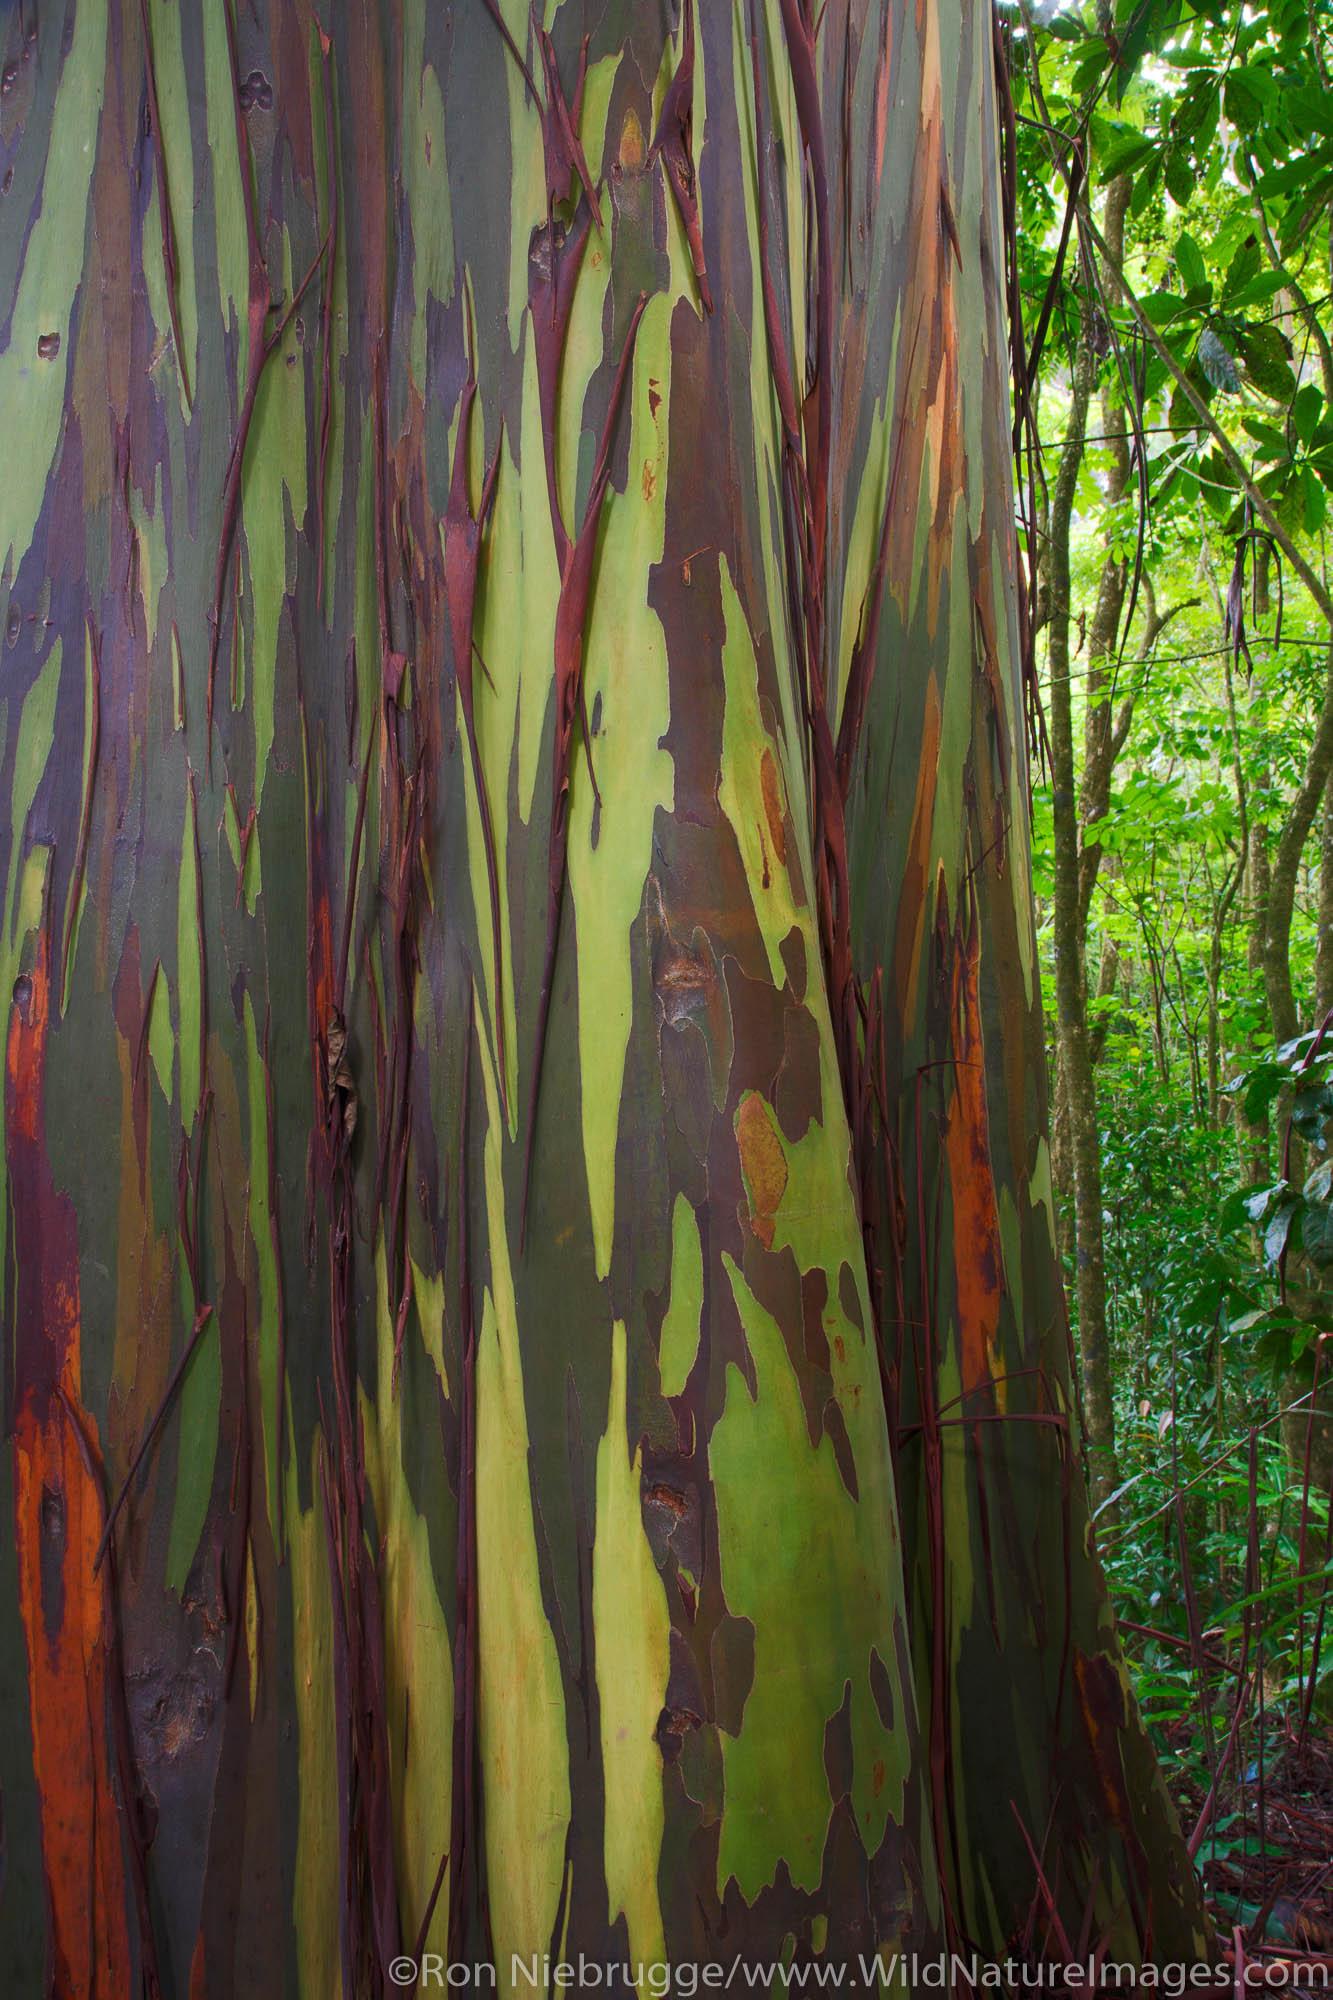 Colorful Eucalyptus Trees along the Hana Highway,Maui, Hawaii.